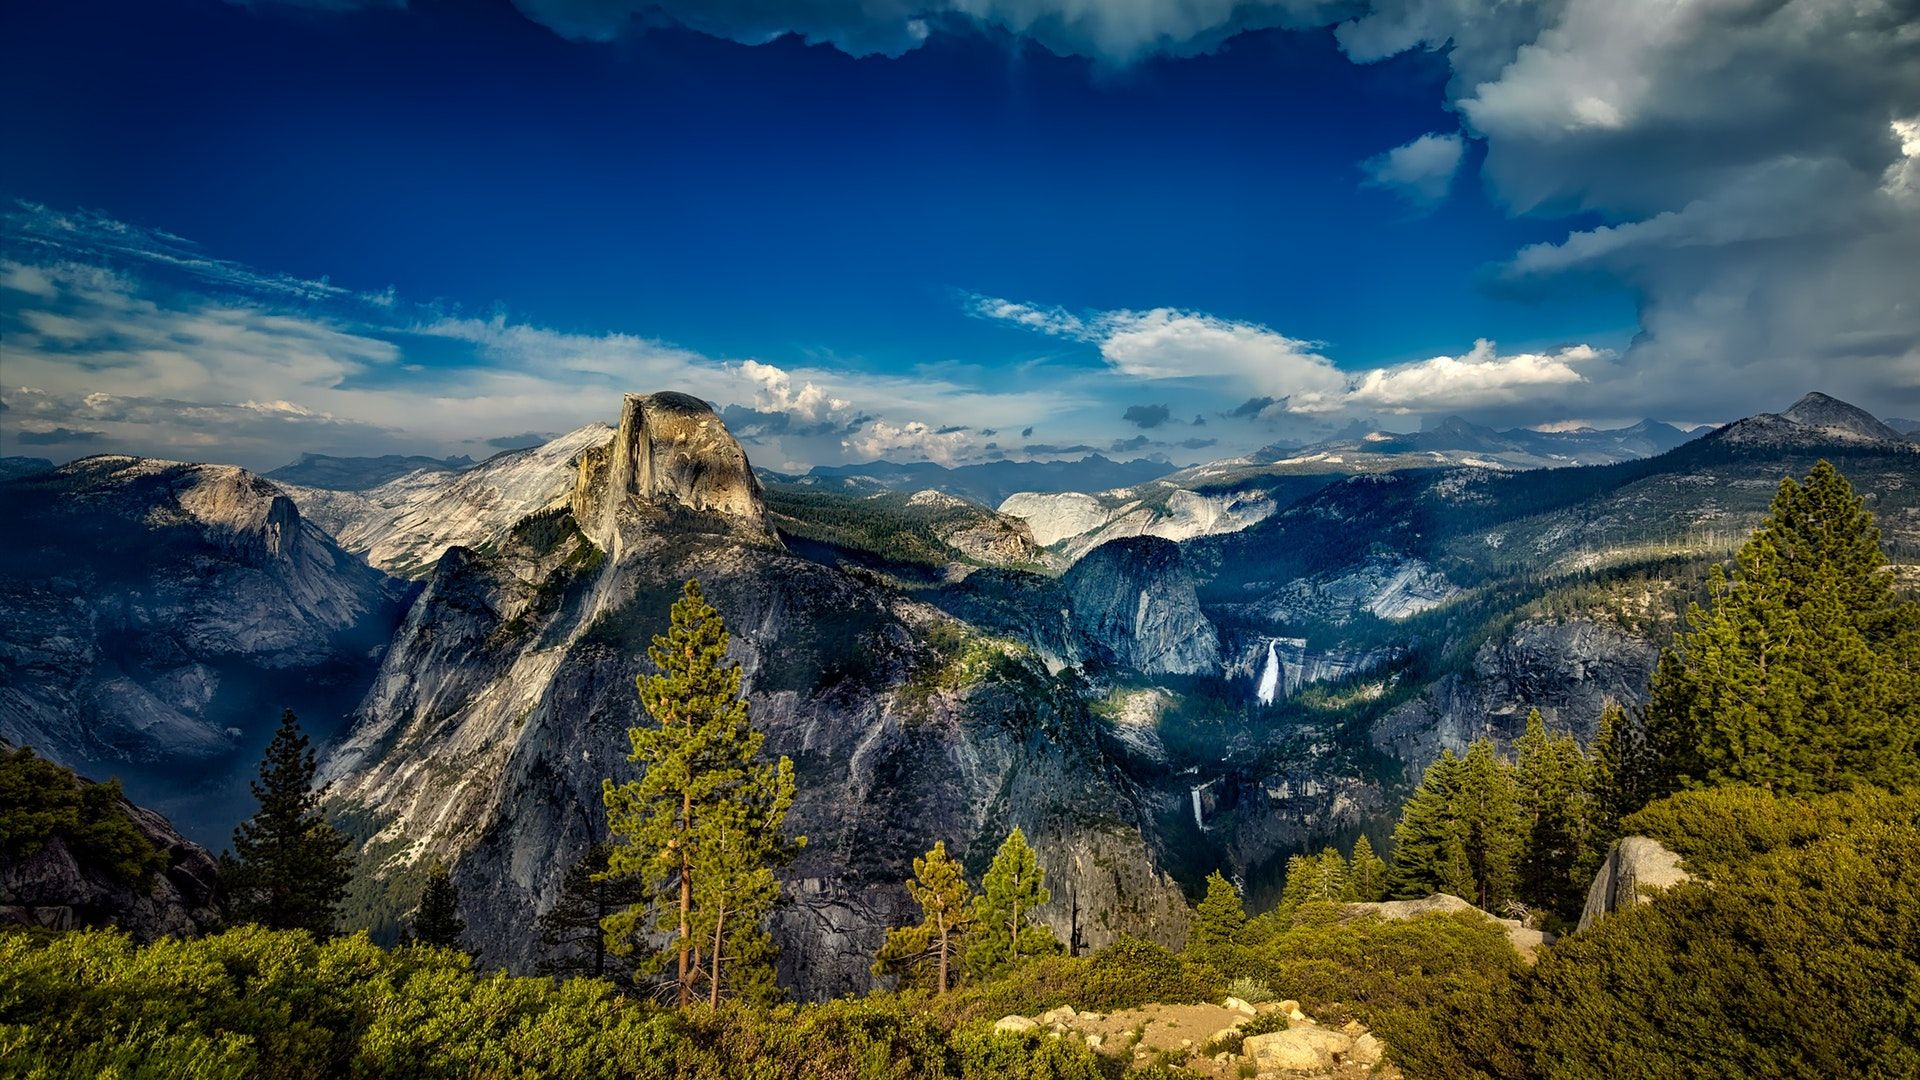 Yosemite National Park California 1920x1080 Hd Wallpaper